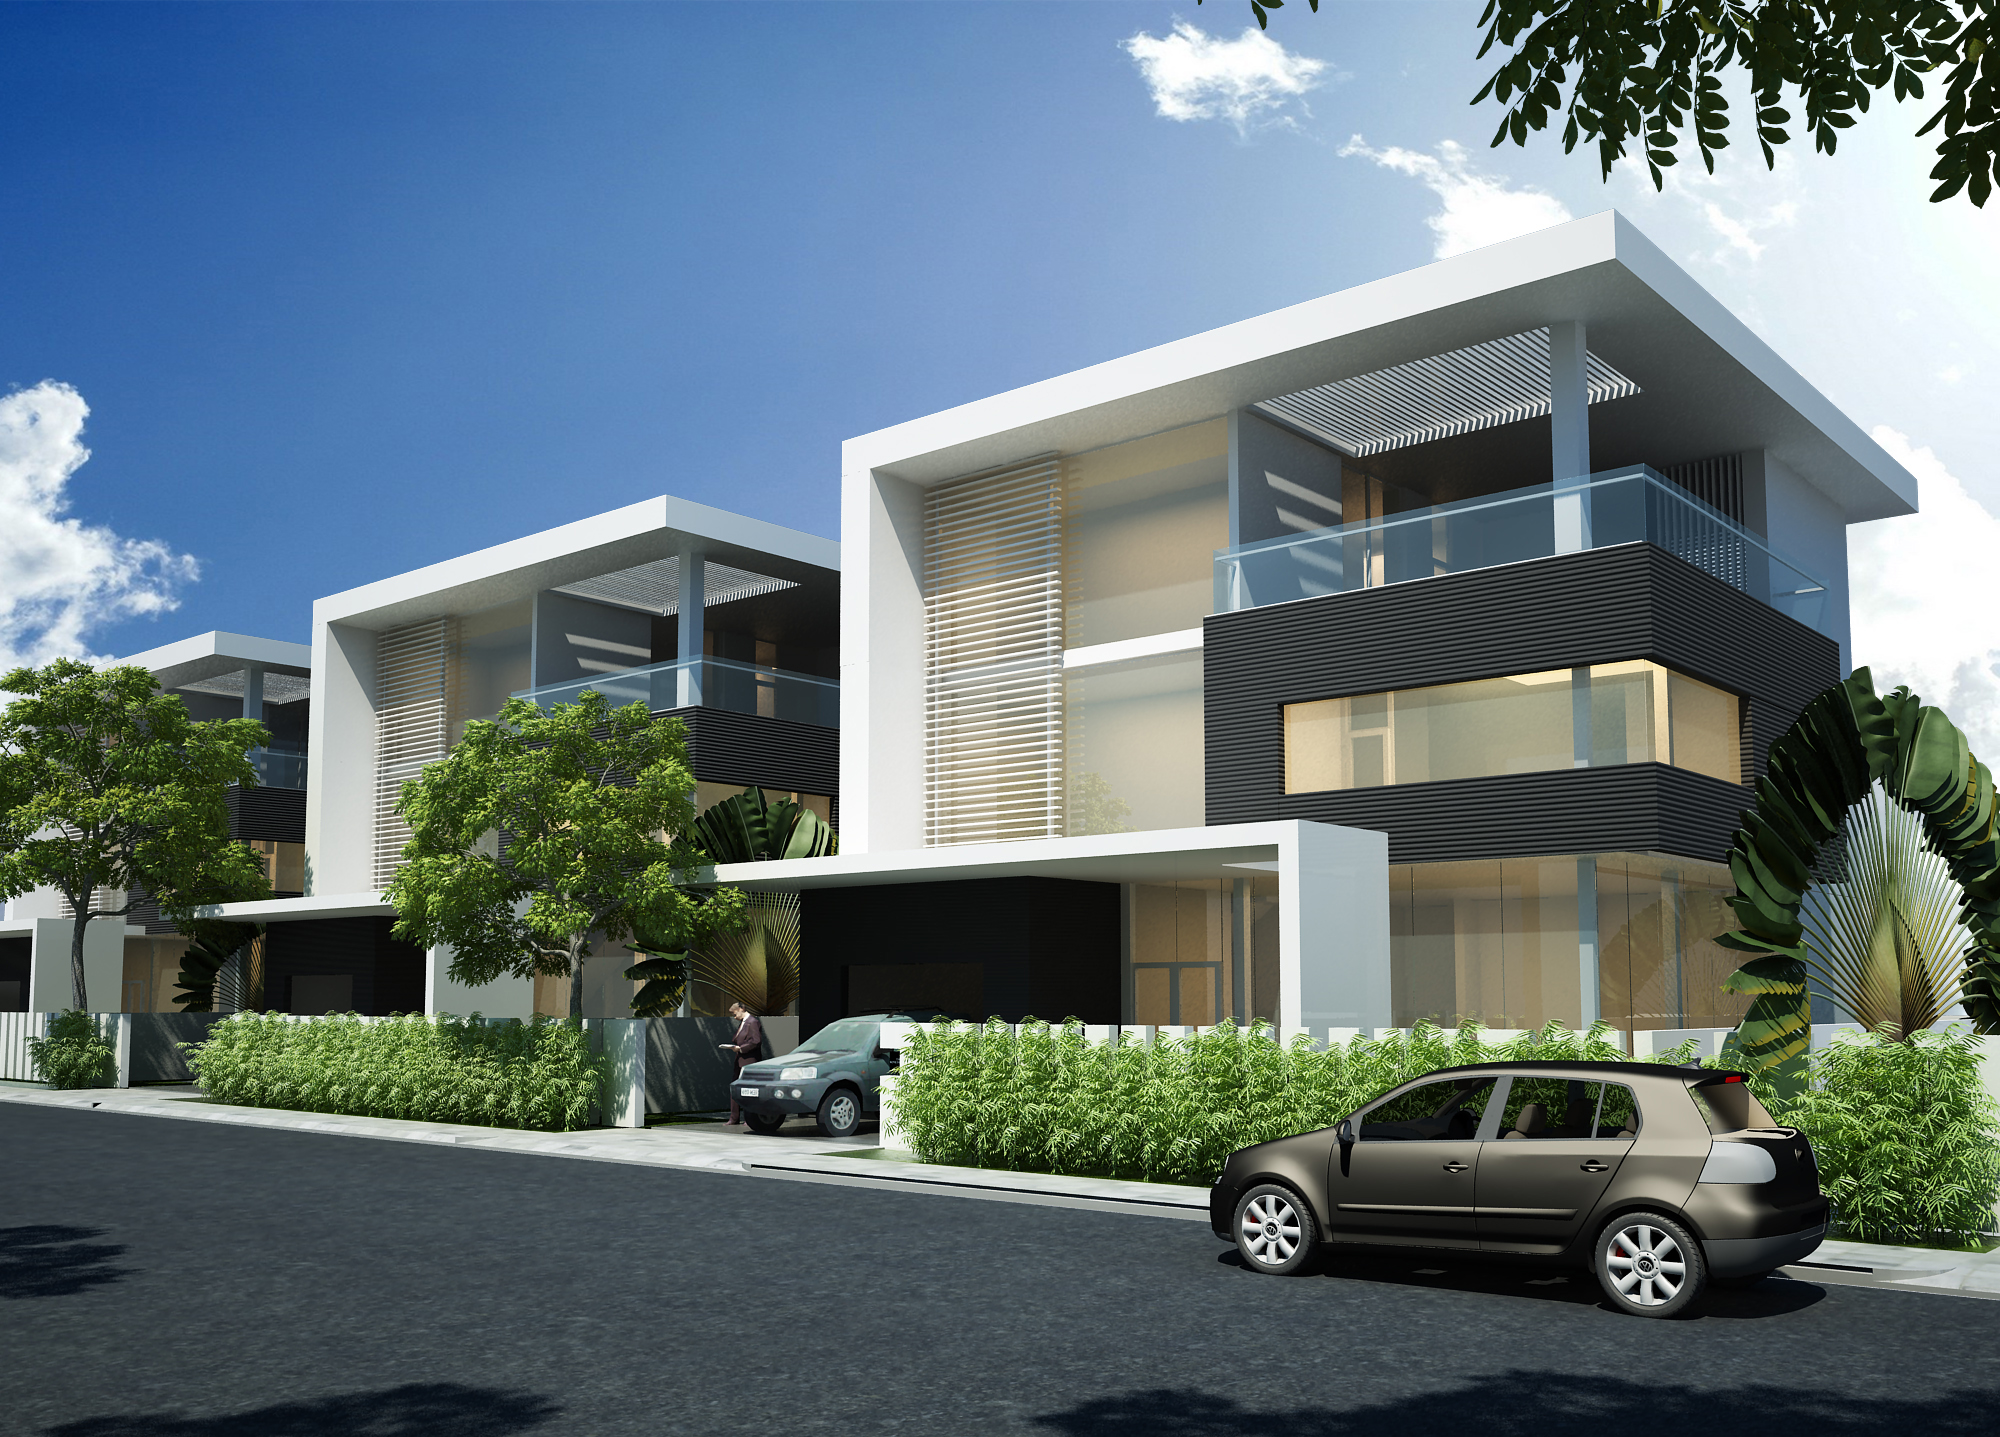 3d Exterior Home Design Software Free Online Sovremennyj Dizajn Na Vip 1gl Ru,Indian Very Small Modular Kitchen Designs